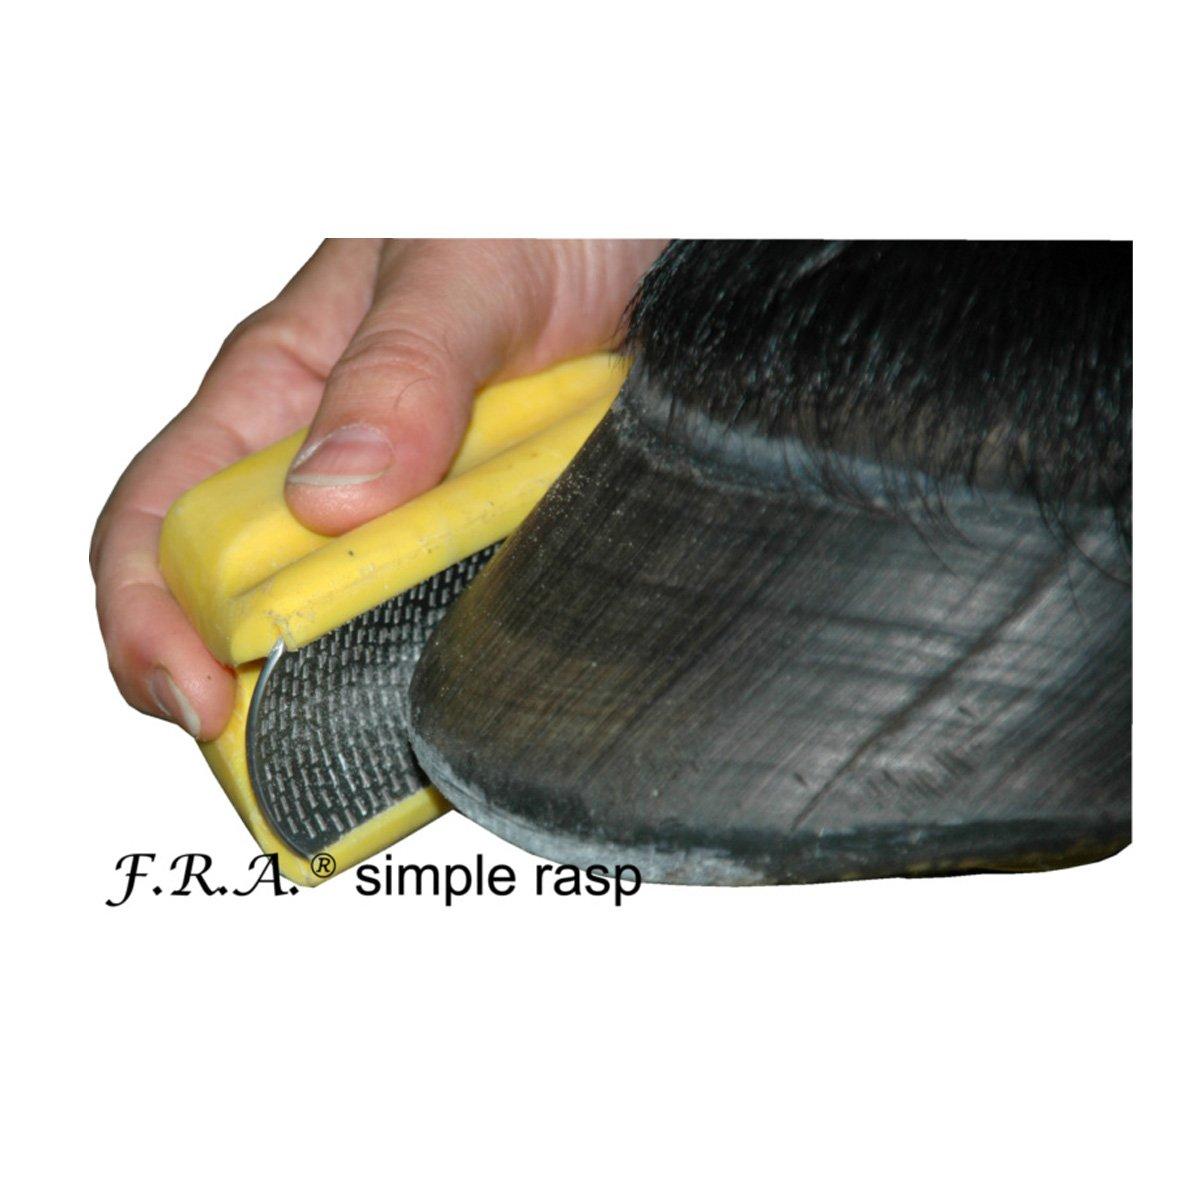 Simple Rasp Hufraspel F.r.a. grob//rot